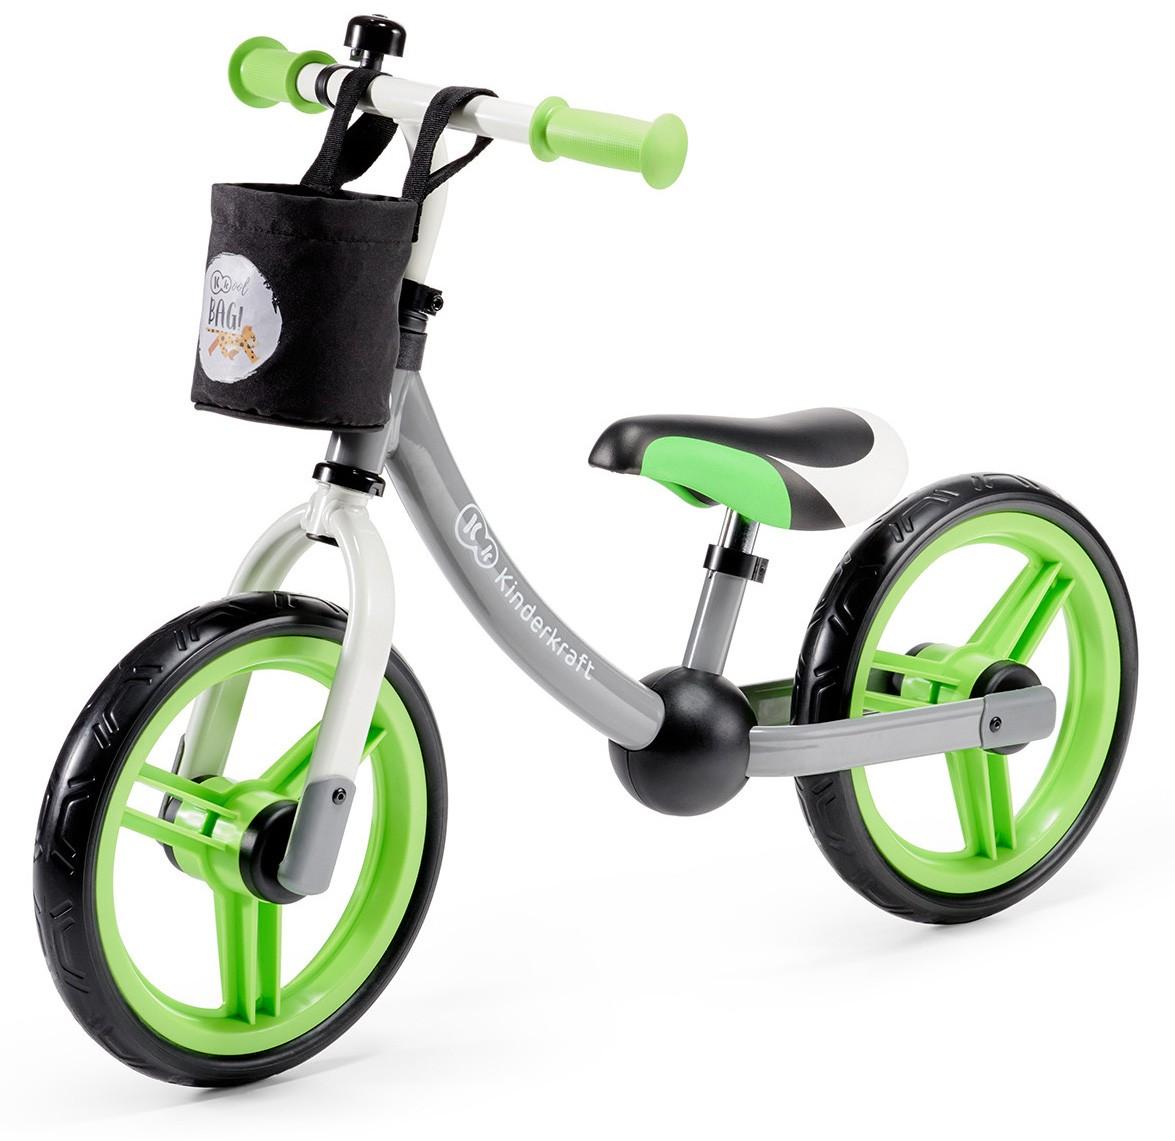 Bici Senza Pedali 2Way Next Verde